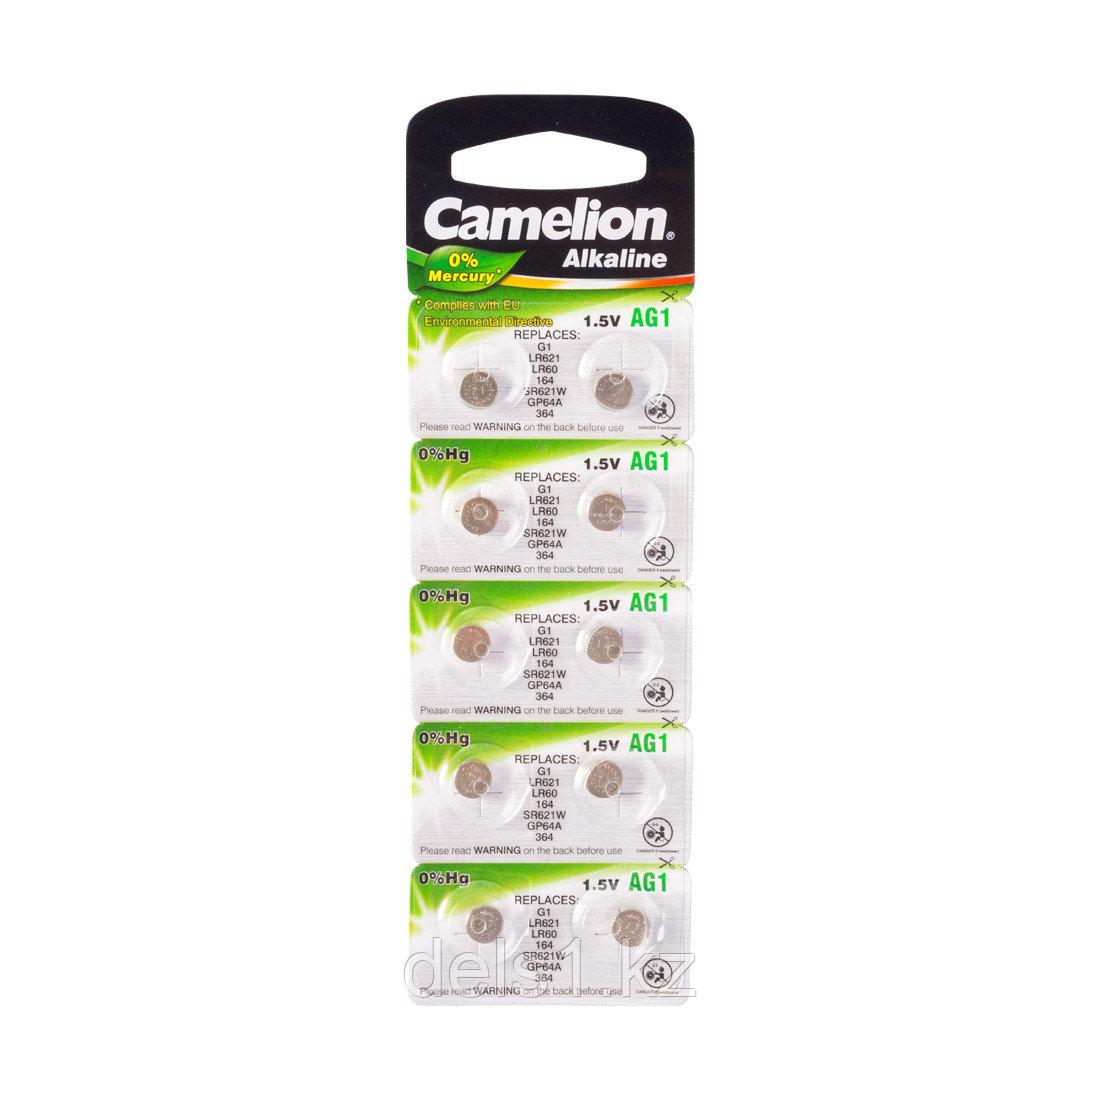 Батарейка, CAMELION, AG1-BP10(0%Hg), Alkaline, AG1, 1.5V, 0% Ртути, 10 шт., Блистер